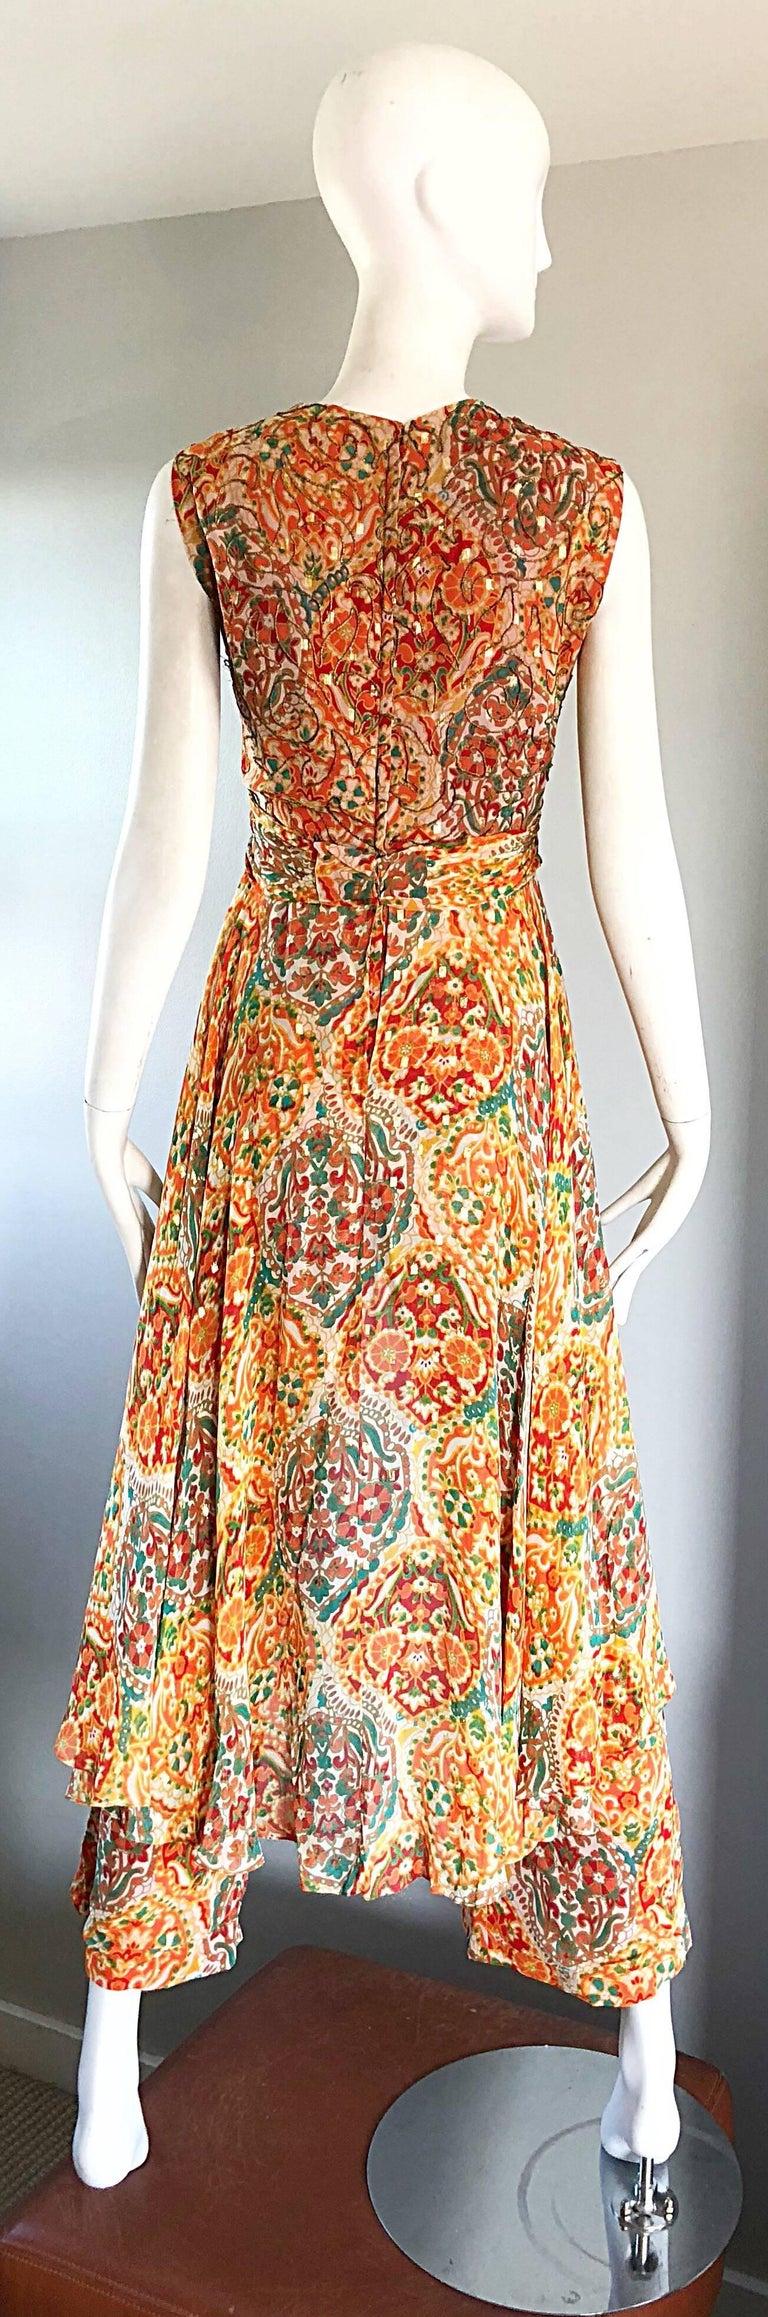 Oscar de la Renta Silk Boho Batik Print Vintage Jumpsuit with Attached Skirt  For Sale 2